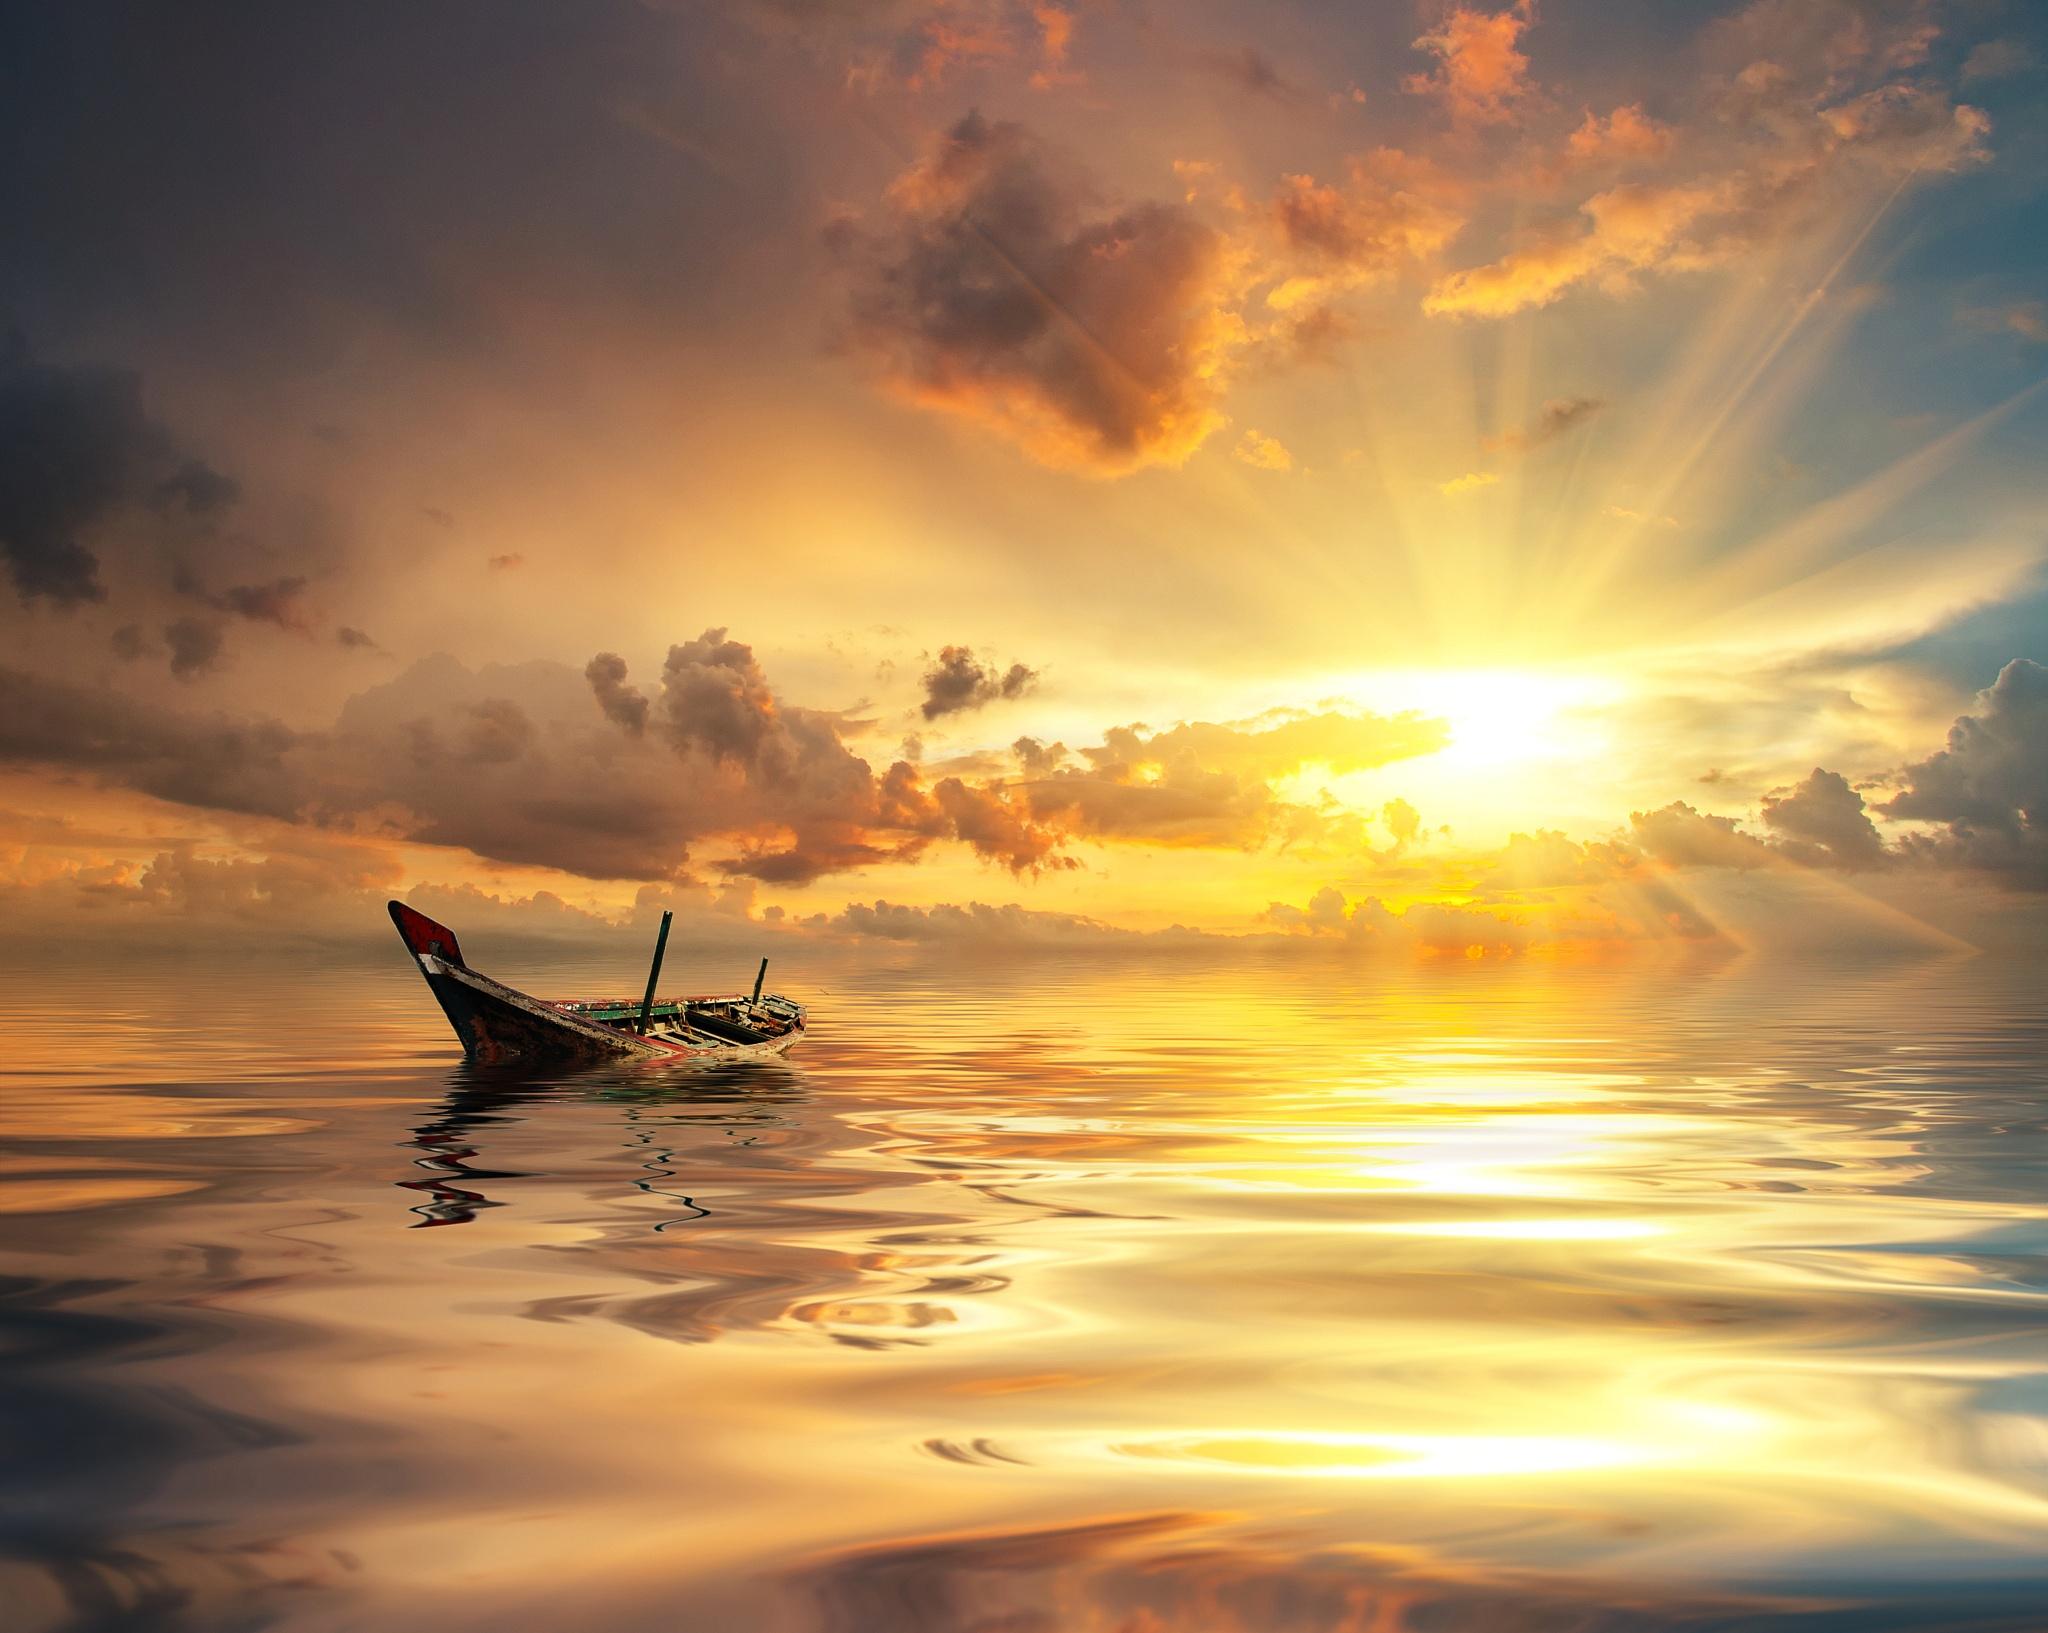 Sinking by Arun kumar